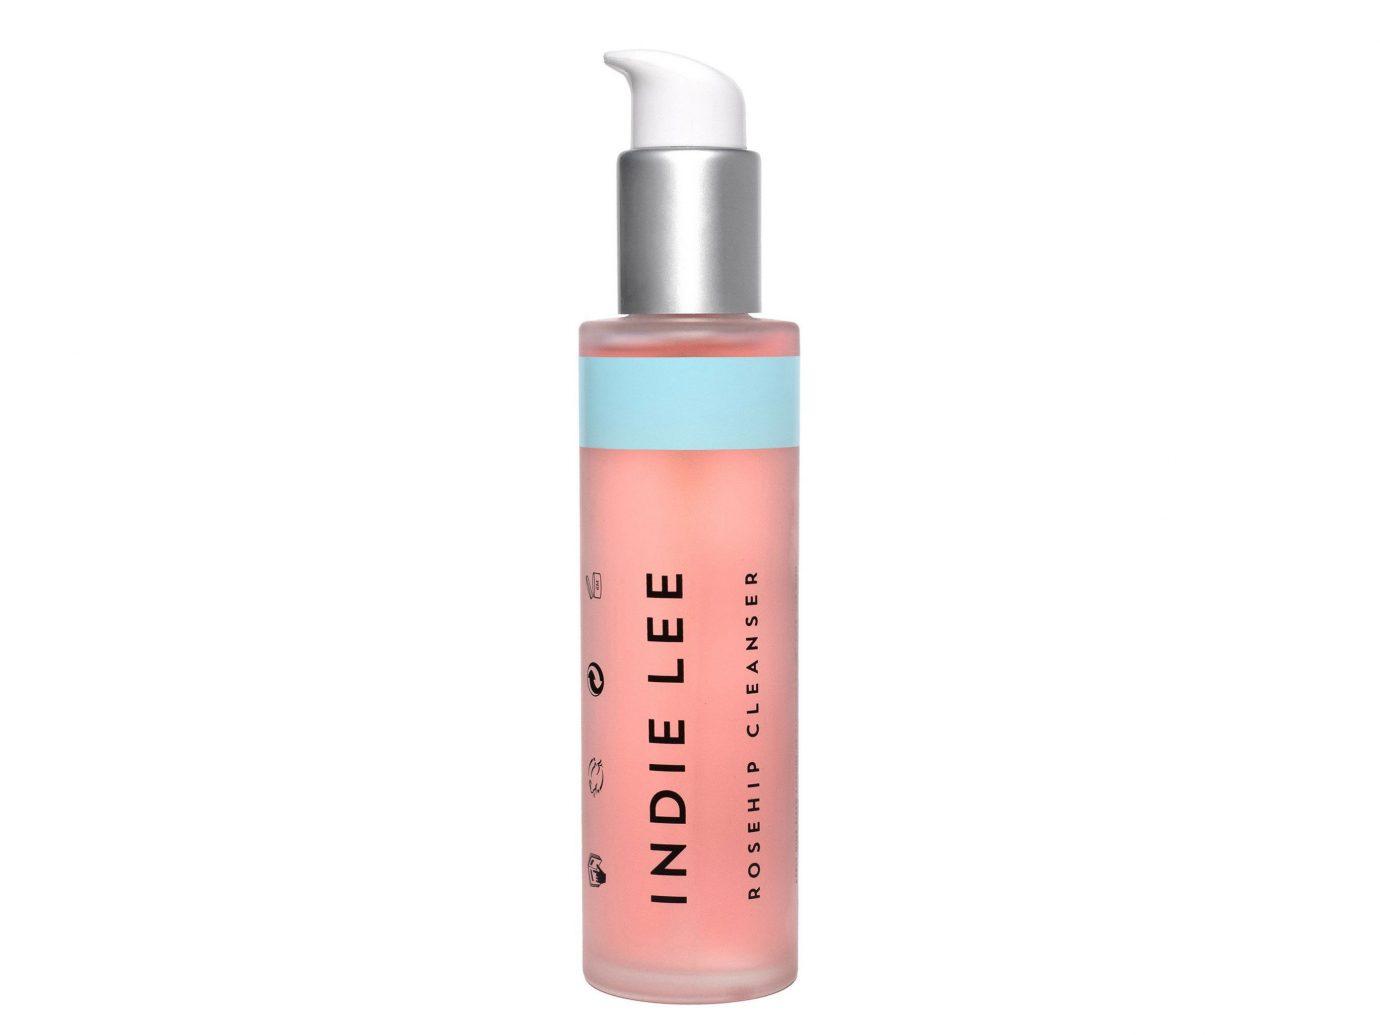 Health + Wellness Travel Shop toiletry Beauty product skin care cosmetics liquid health & beauty